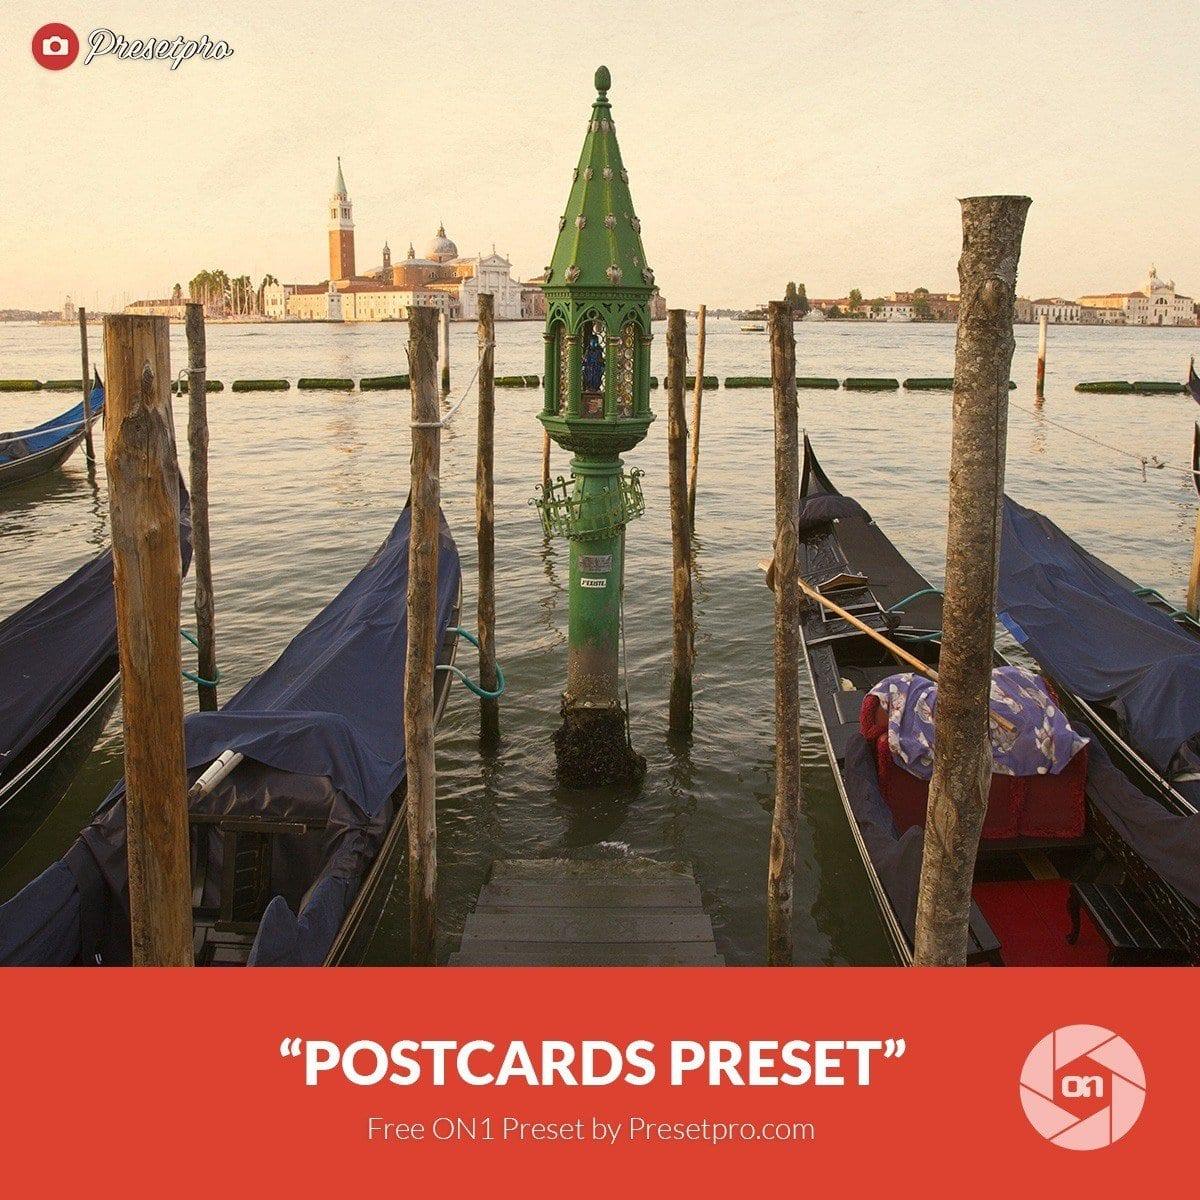 Free-On1-Preset-Postcards-Presetpro.com